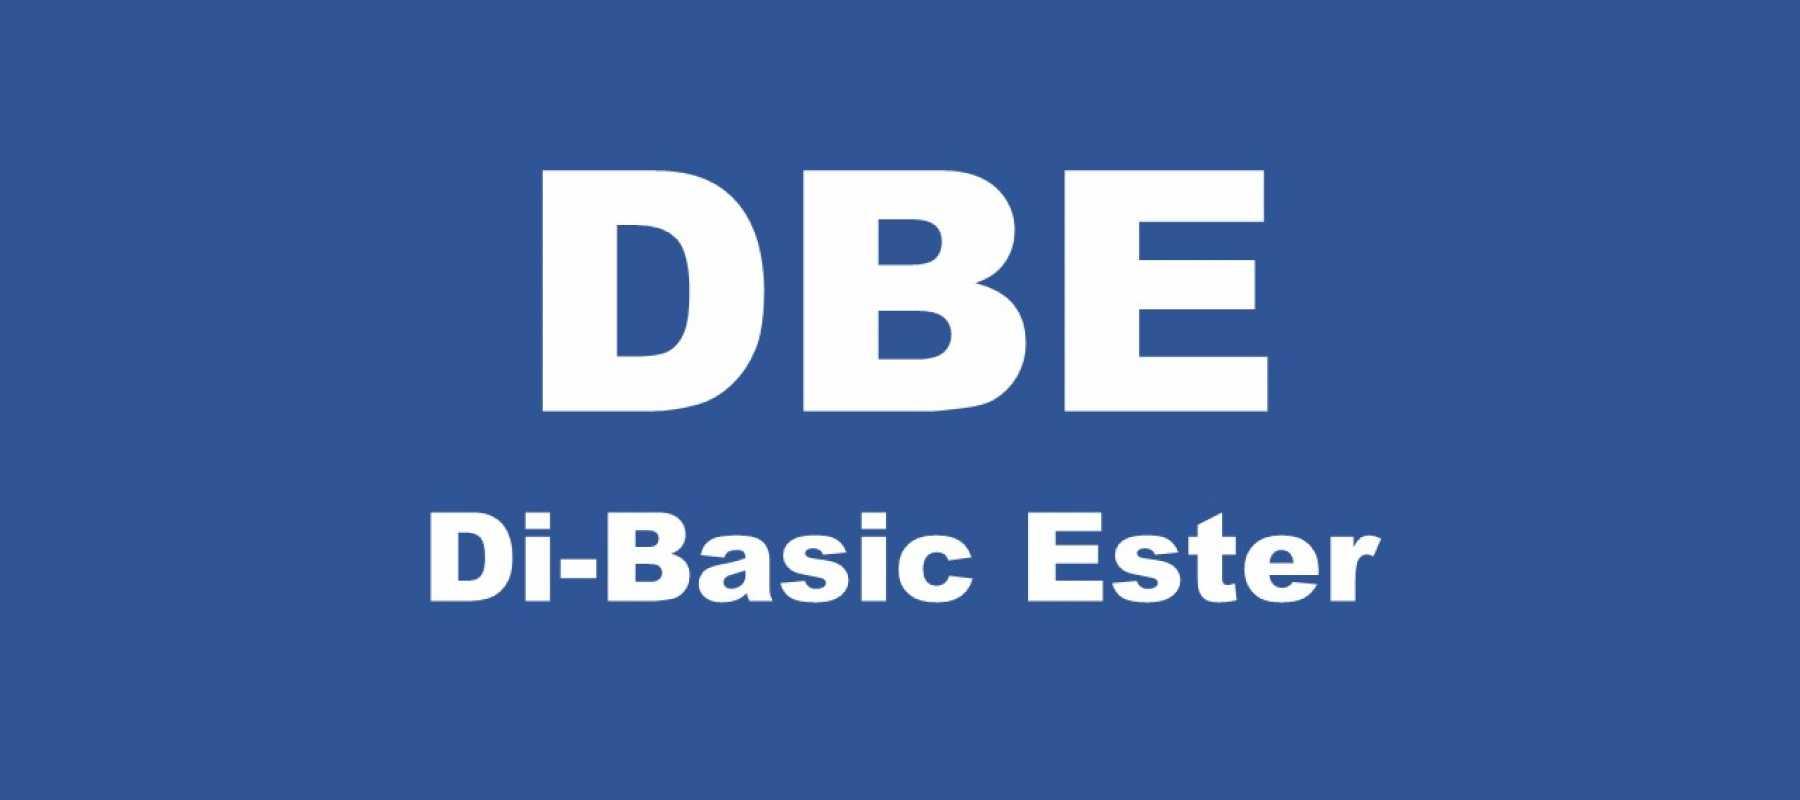 Portfolio Addition – DI-BASIC ESTER